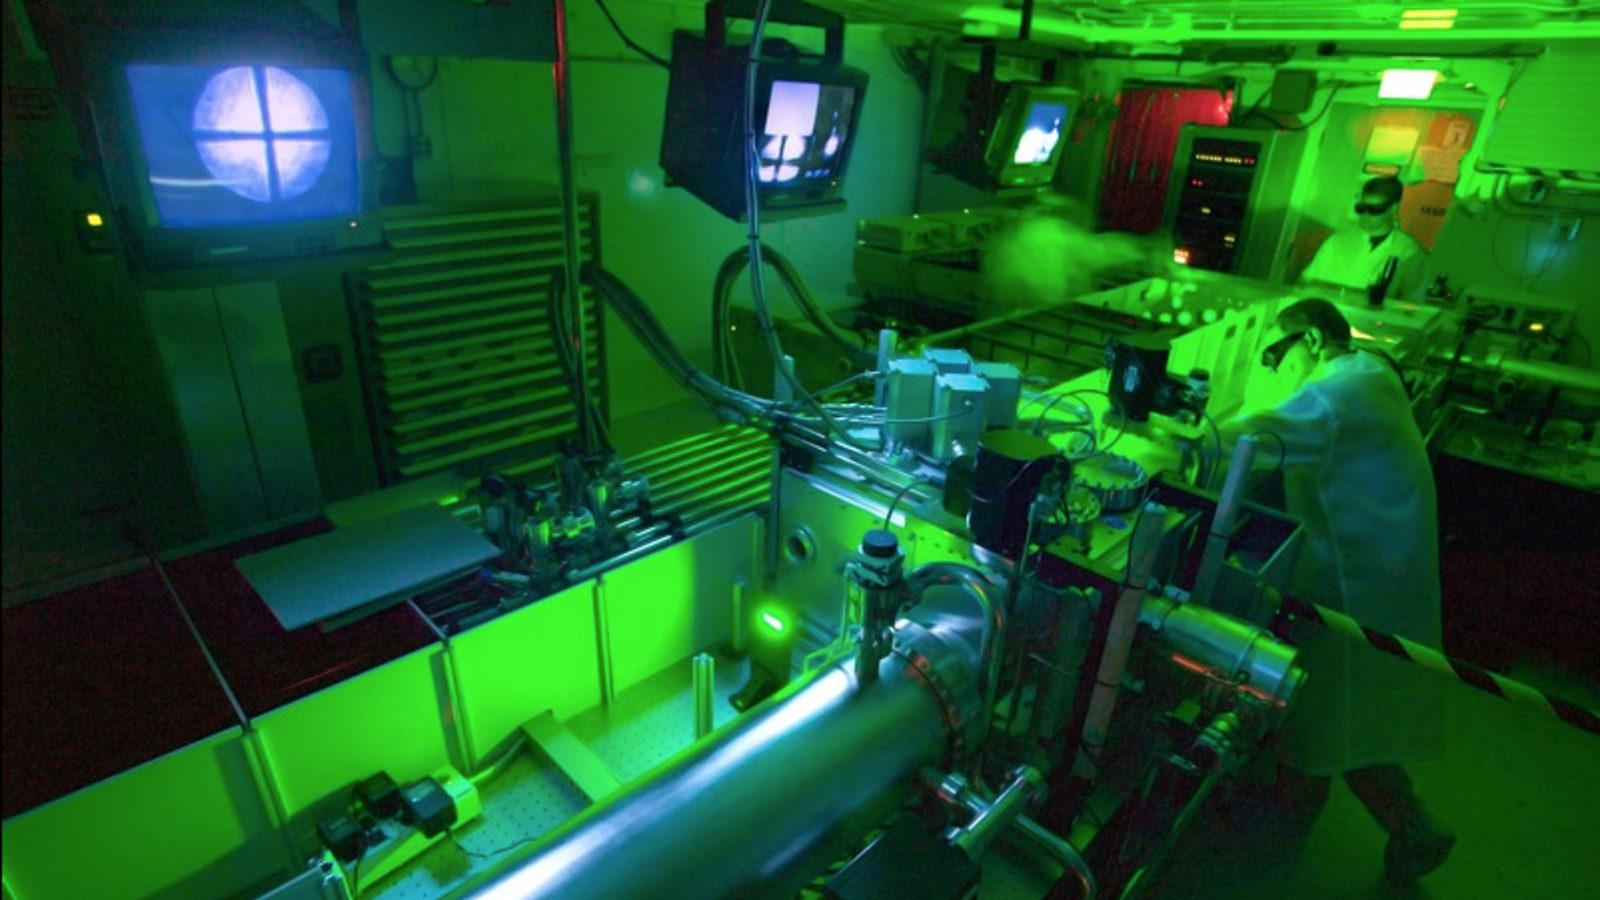 Image: Leemans' laser lab